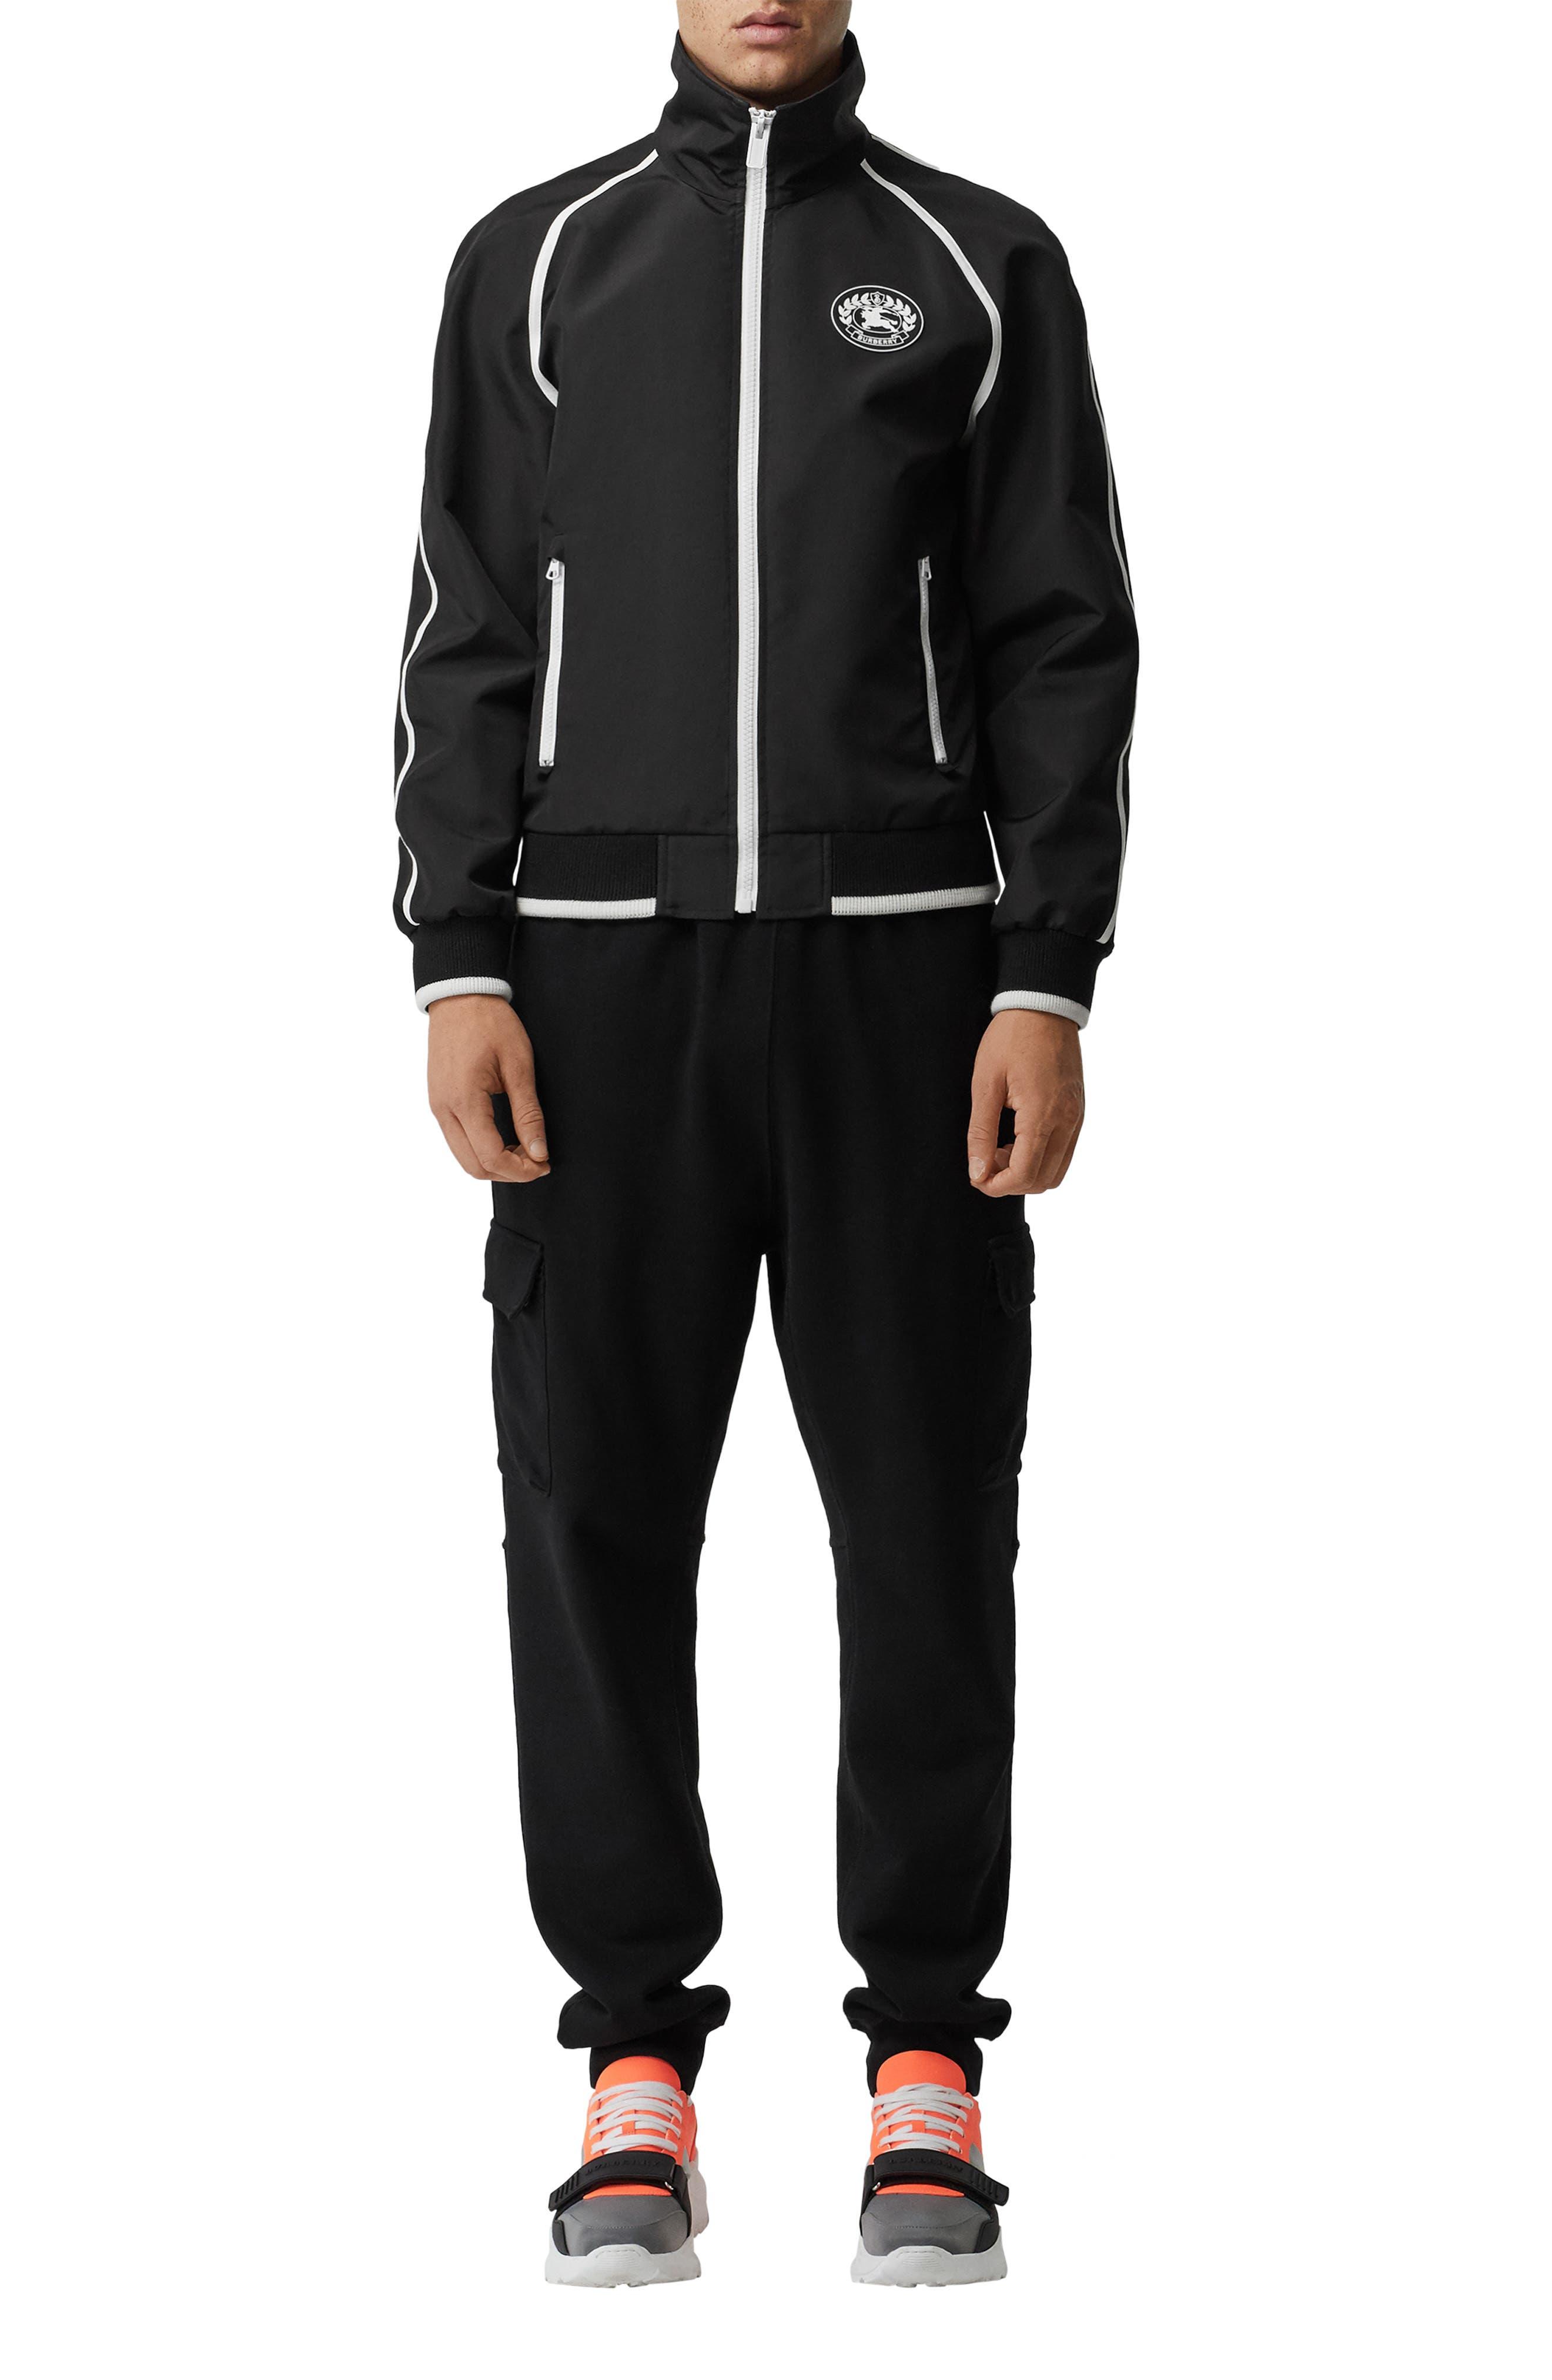 BURBERRY, Northfield Nylon Track Jacket, Alternate thumbnail 5, color, BLACK